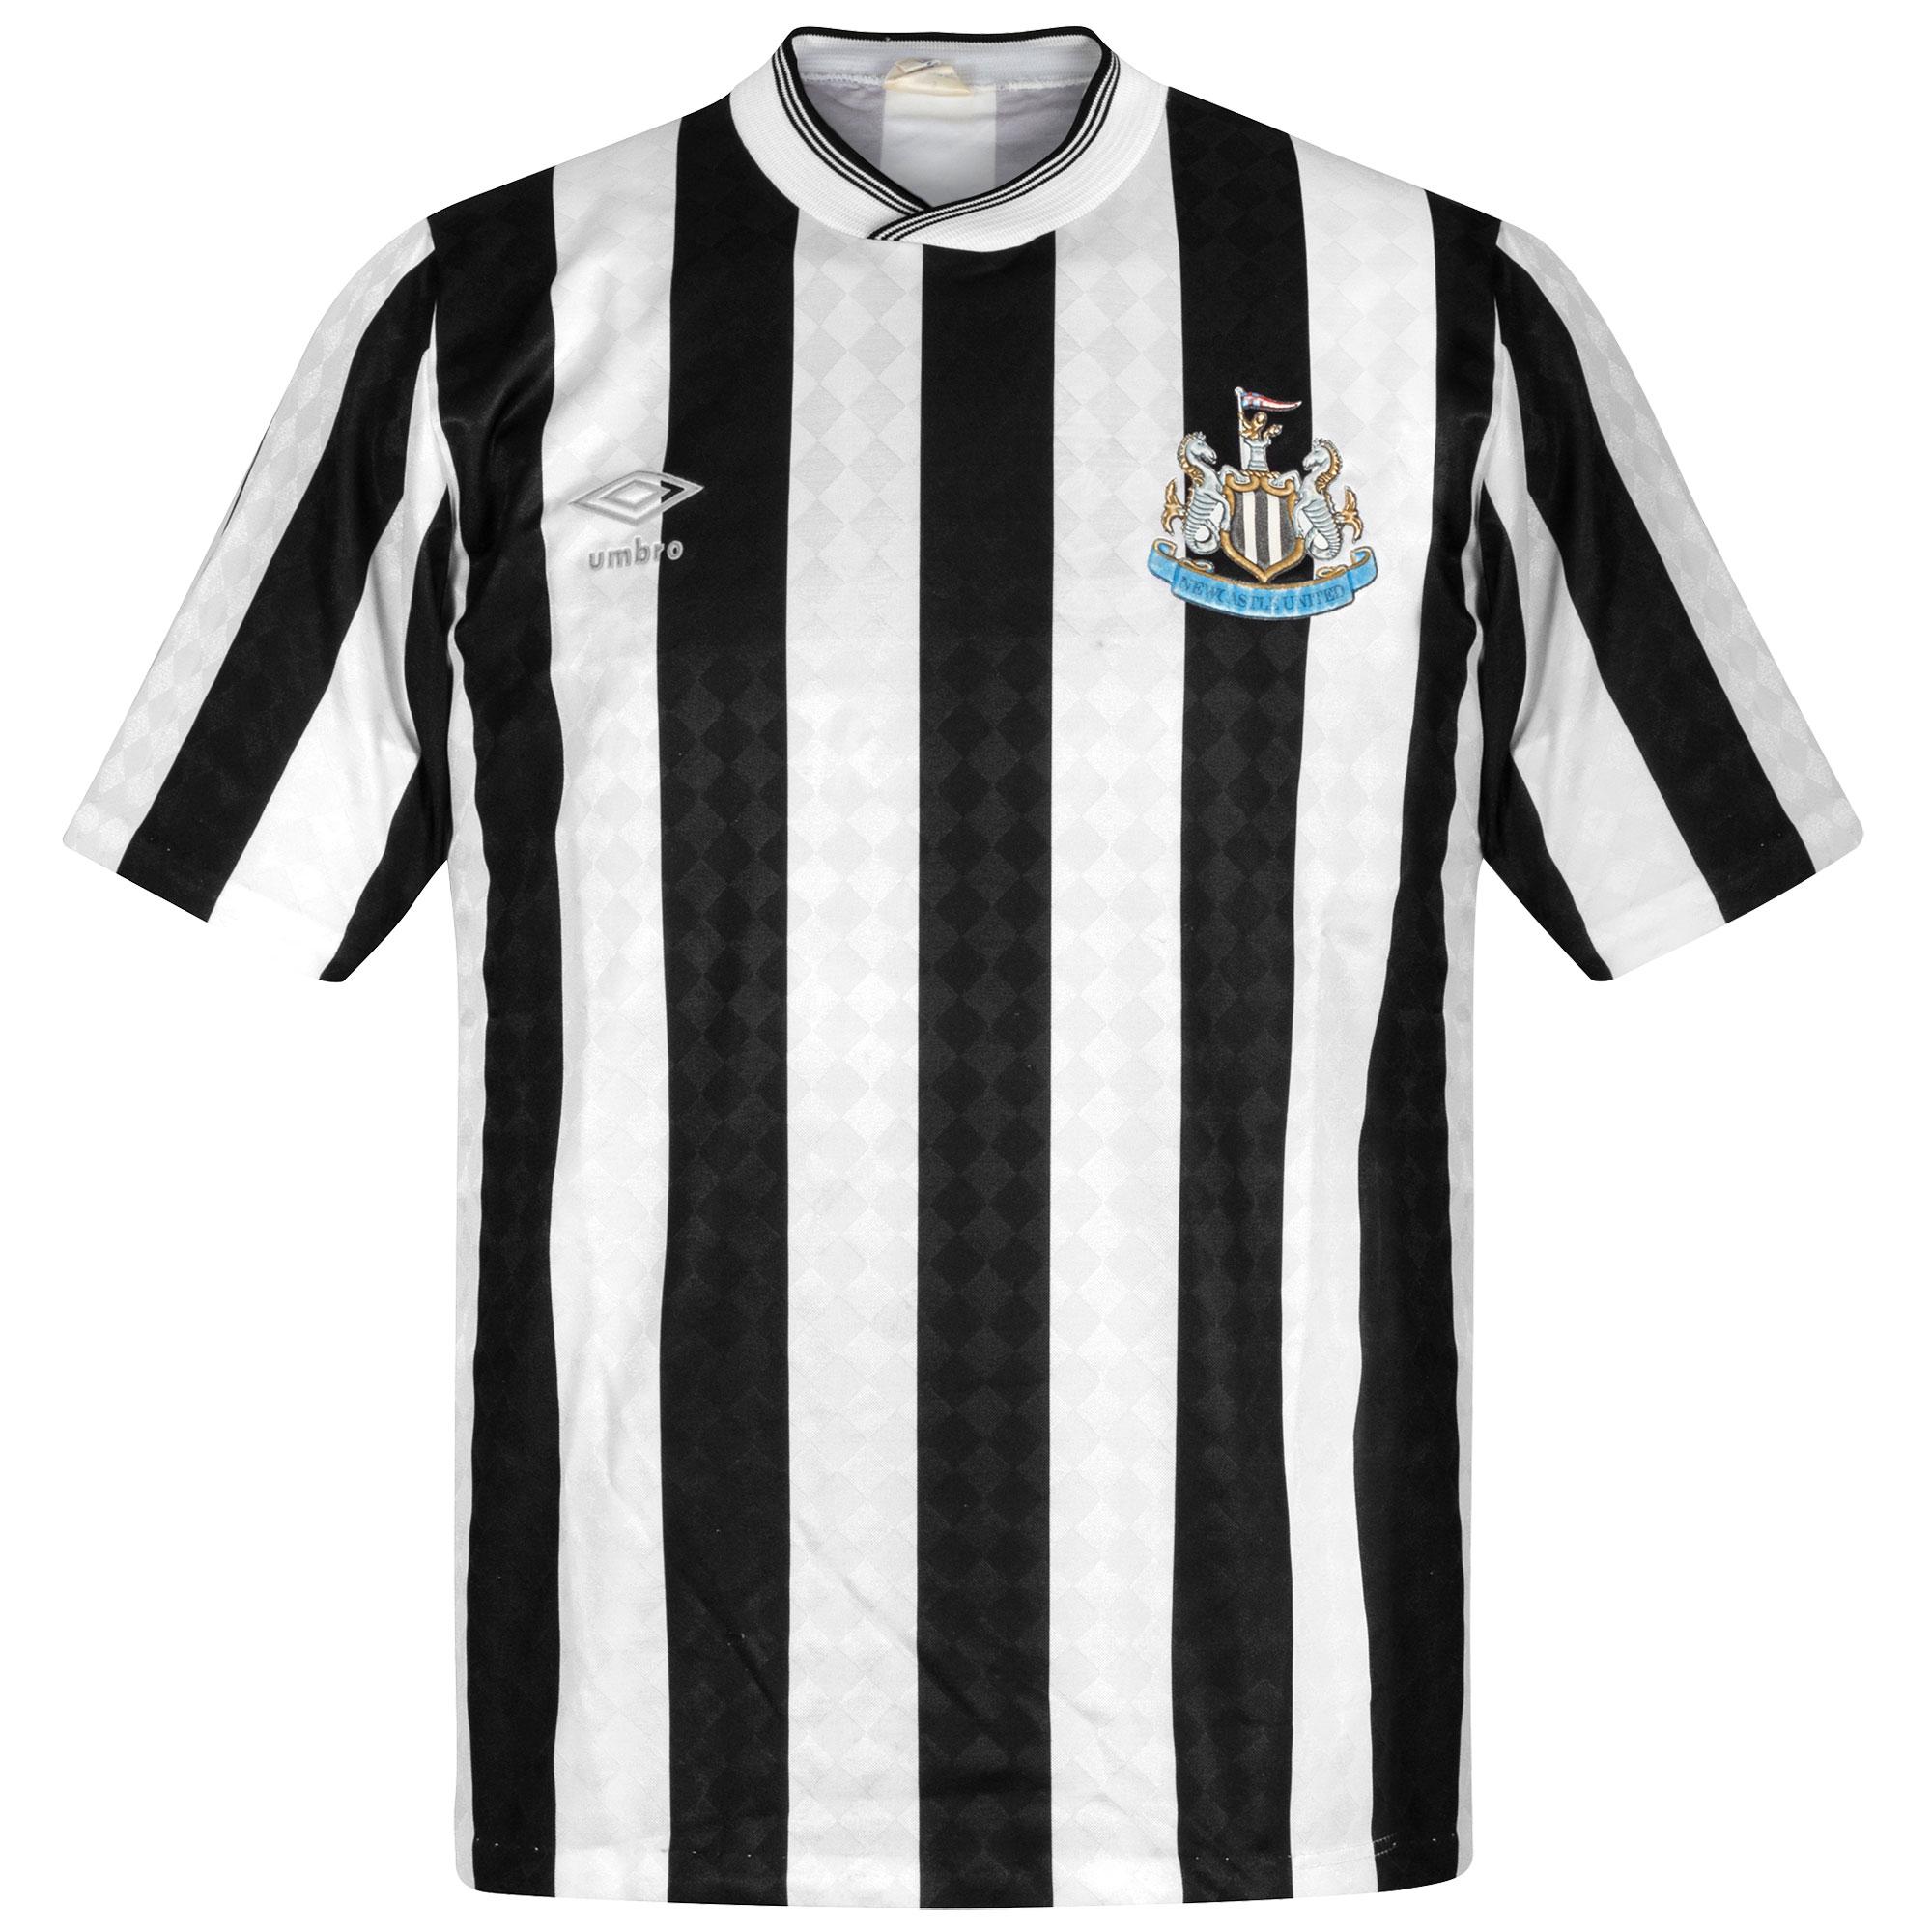 Umbro Newcastle United 1988-1990 Home Shirt- USED Condition (Good) - Size Medium